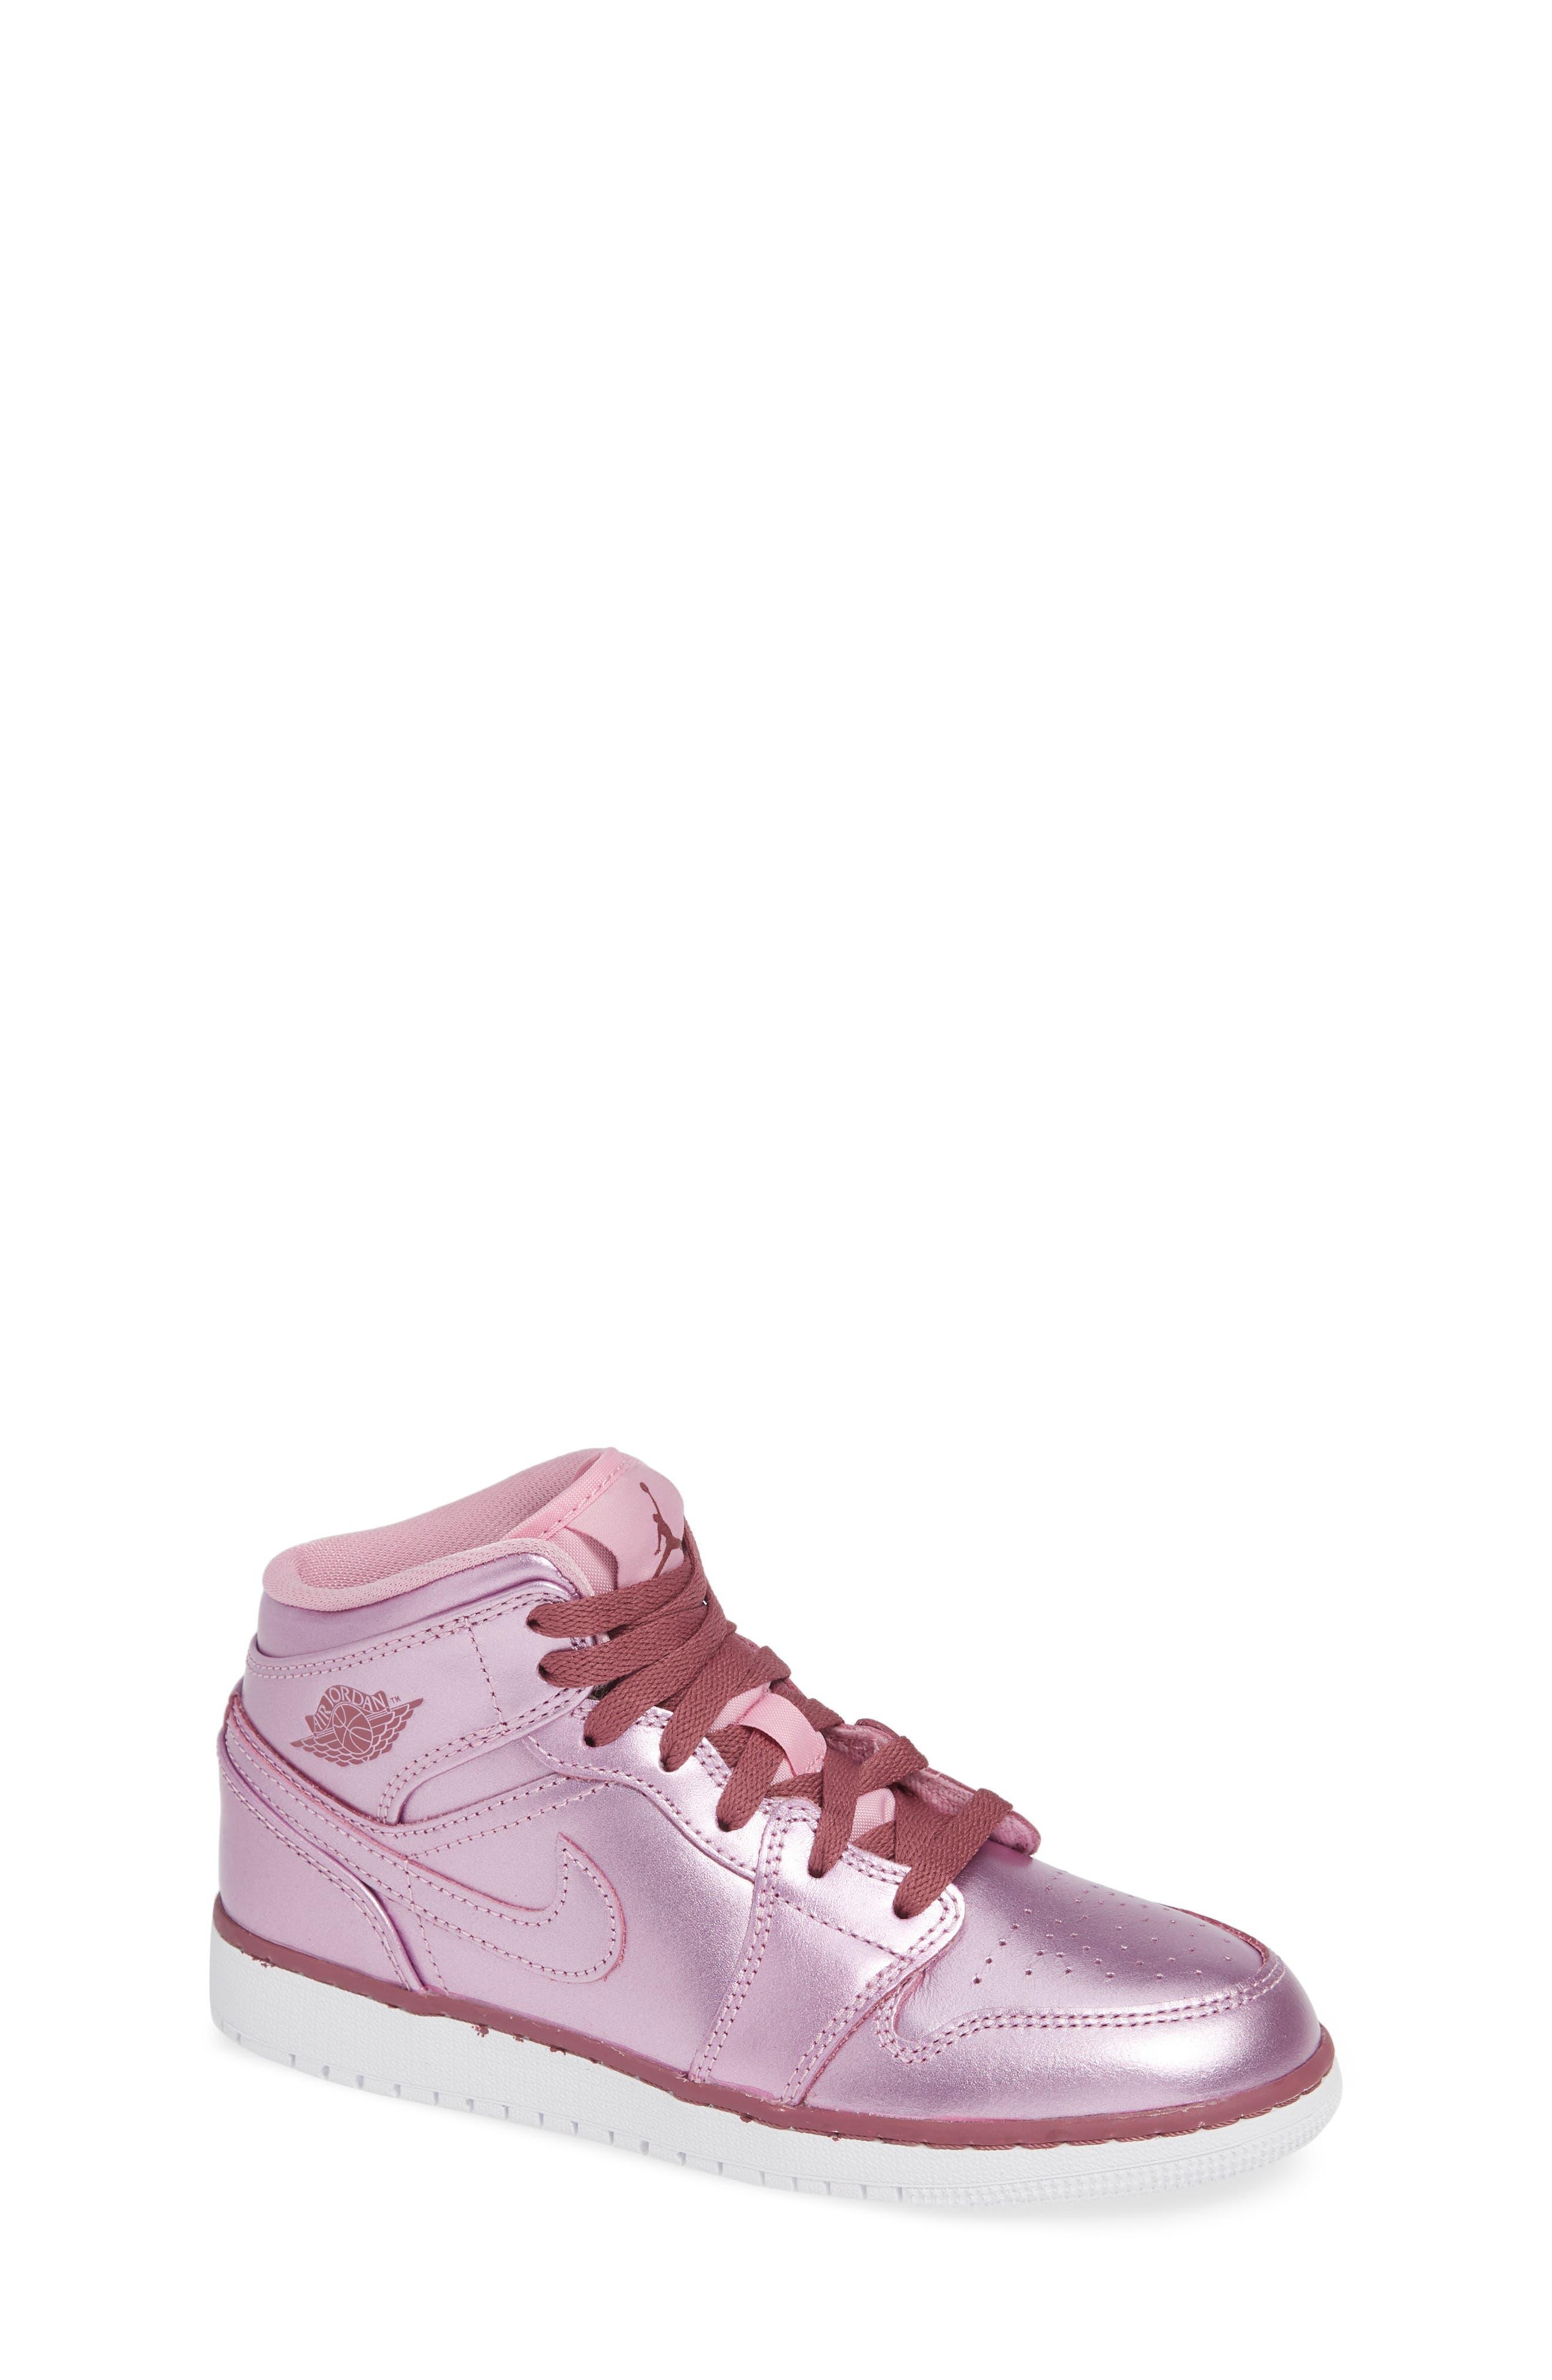 Nike Air Jordan Mid SE GS Sneaker (Baby